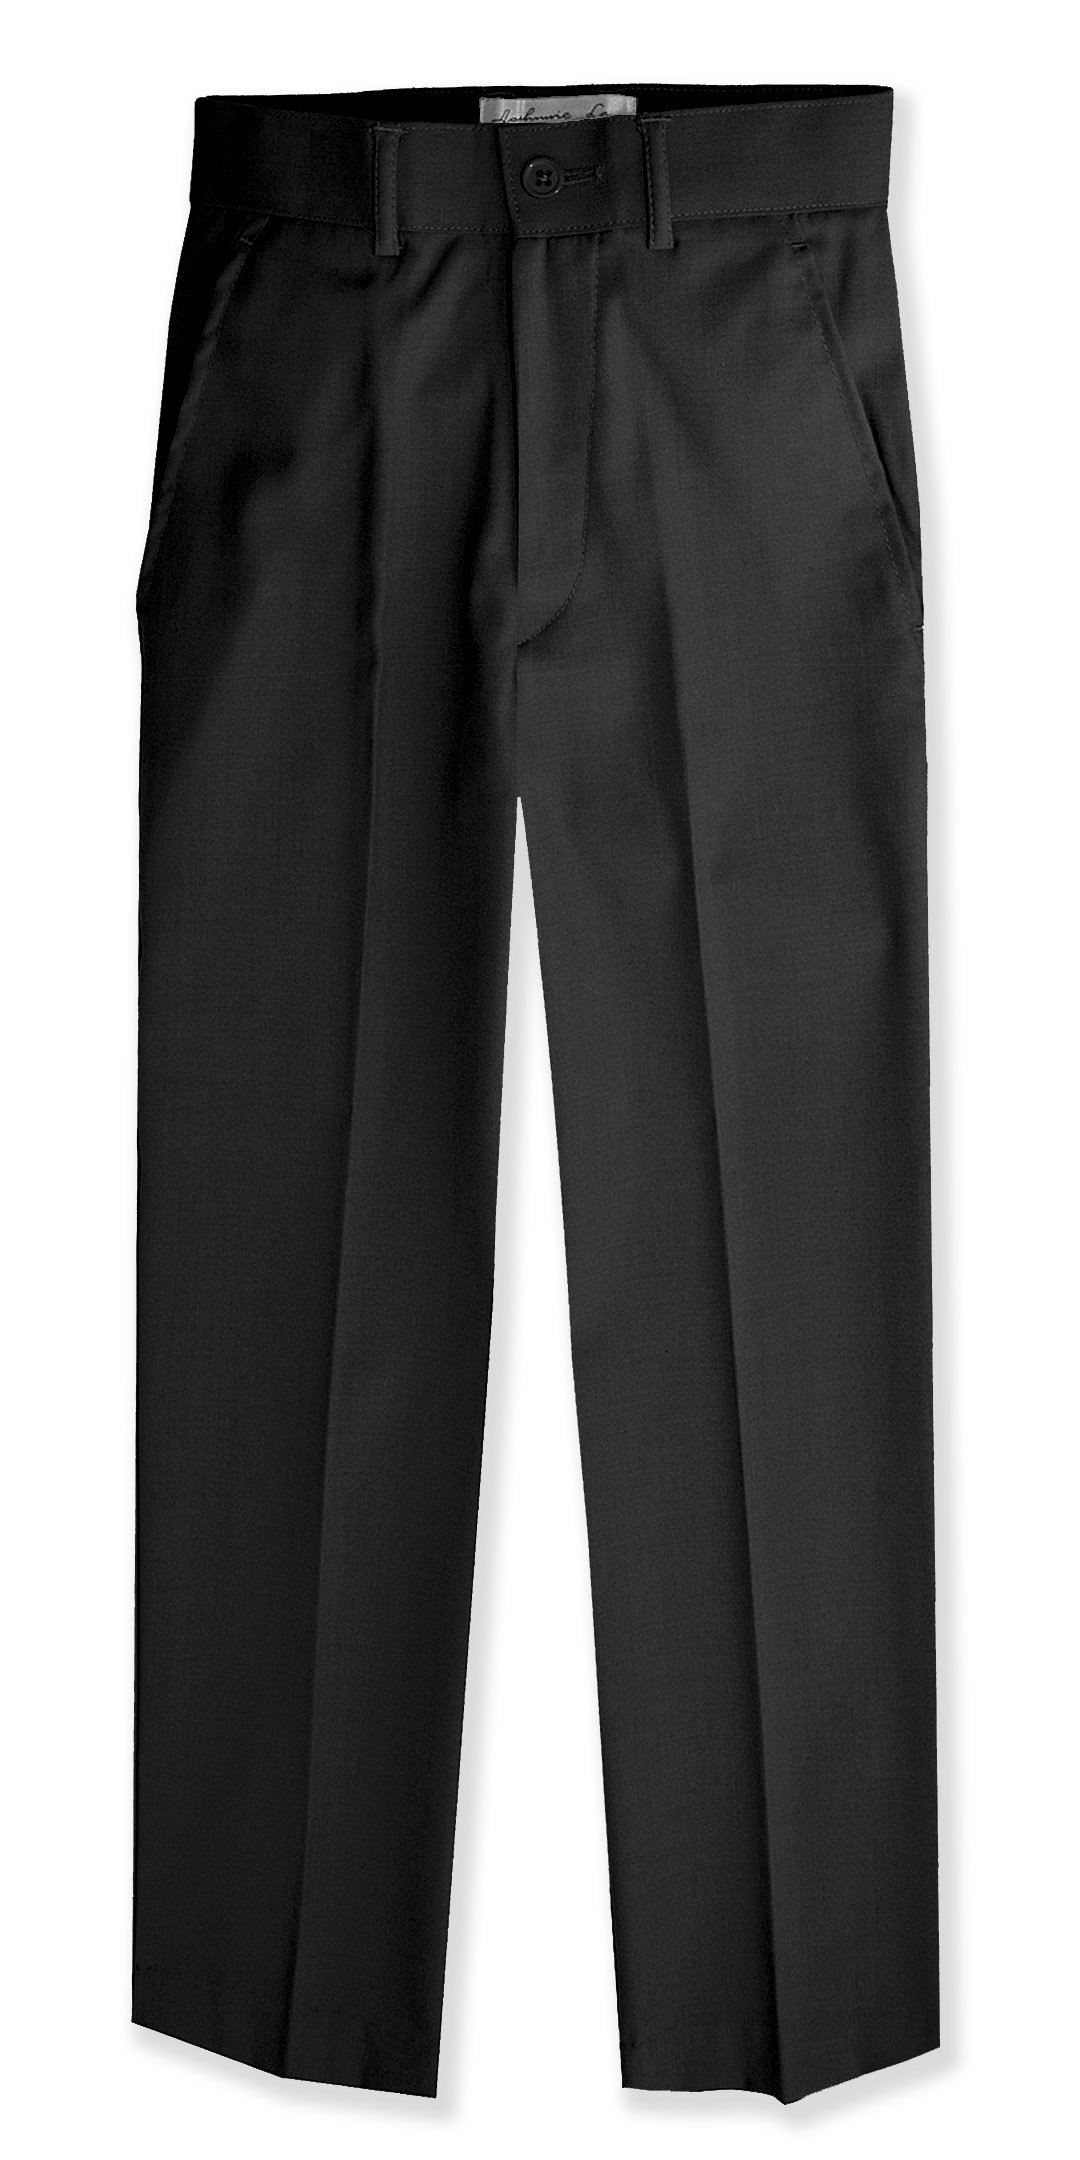 Johnnie Lene Boys Flat Front Slim Fit Dress Pants #JL36 (10, Black)